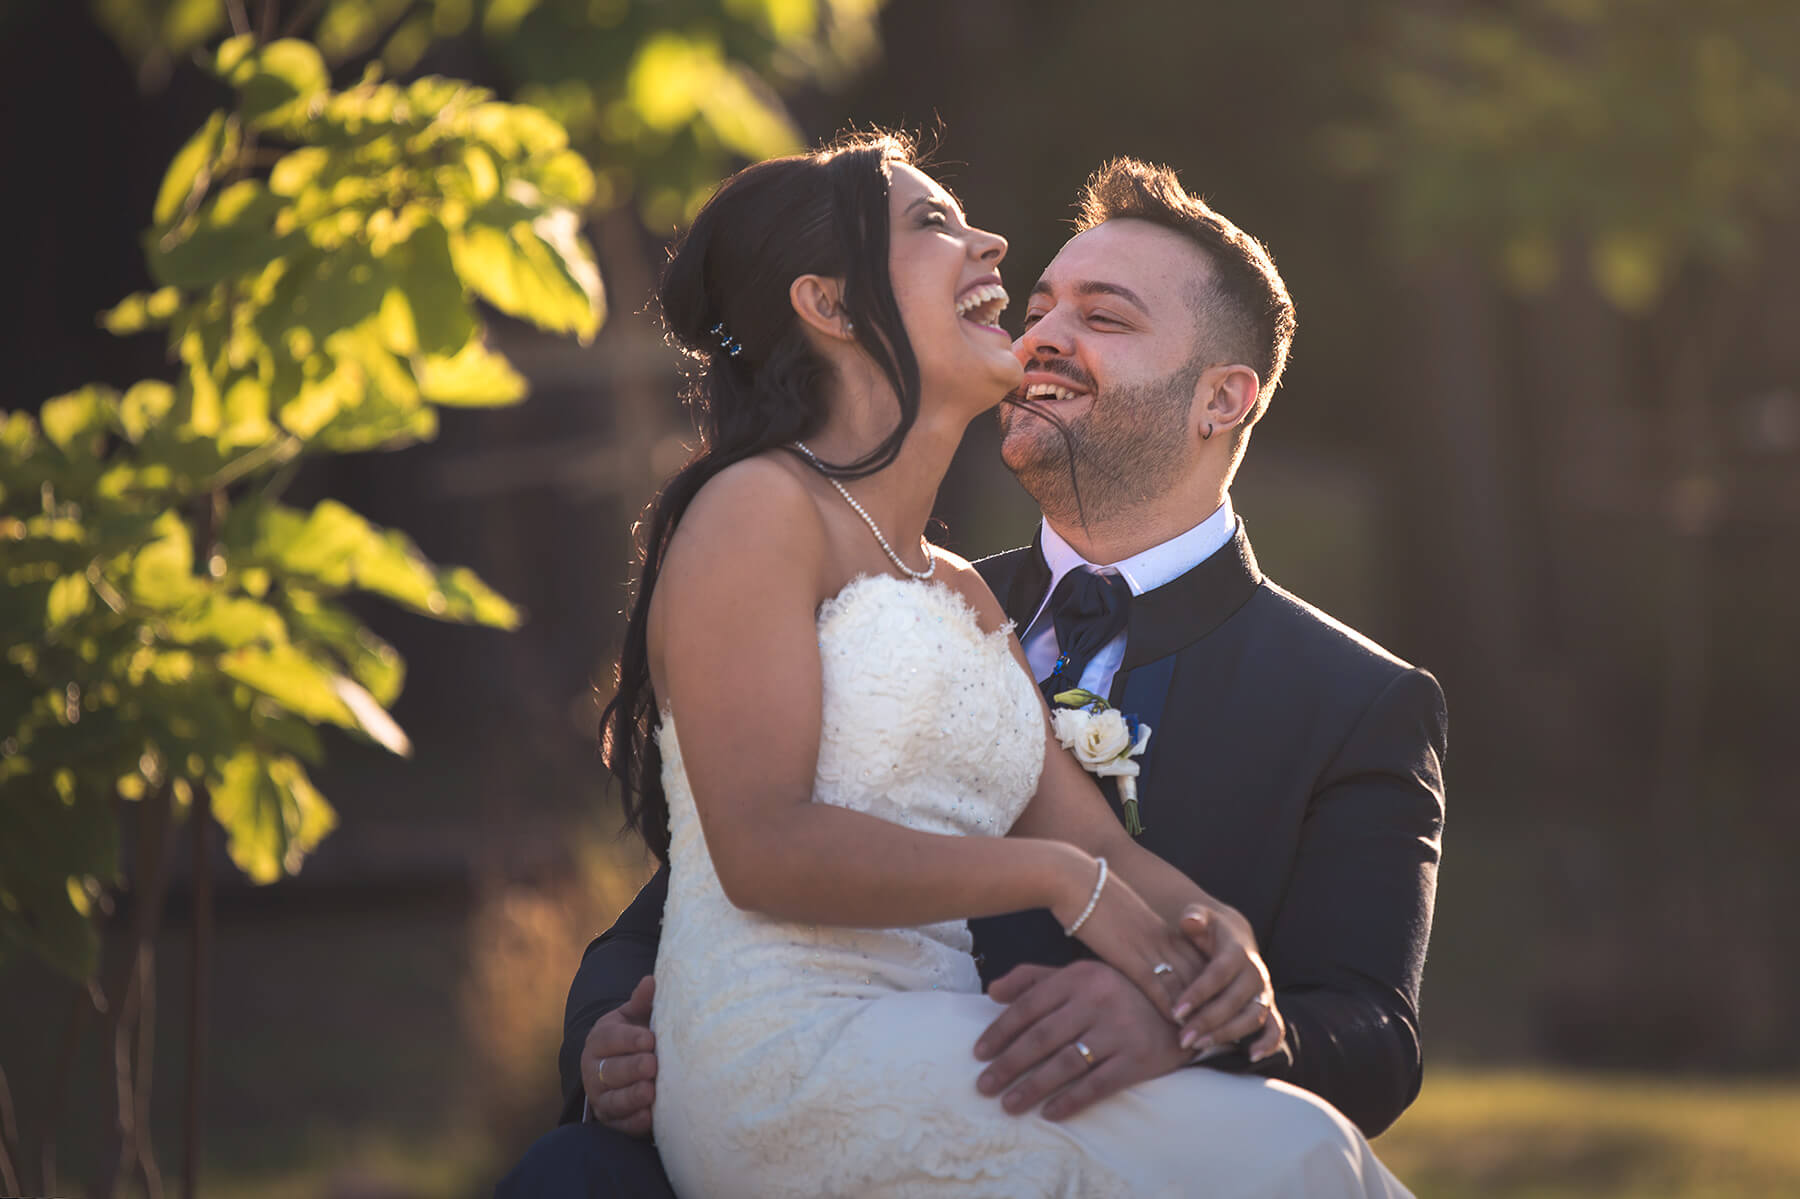 Beniamono-lai-fotografo-di matrimonio-sardegna10